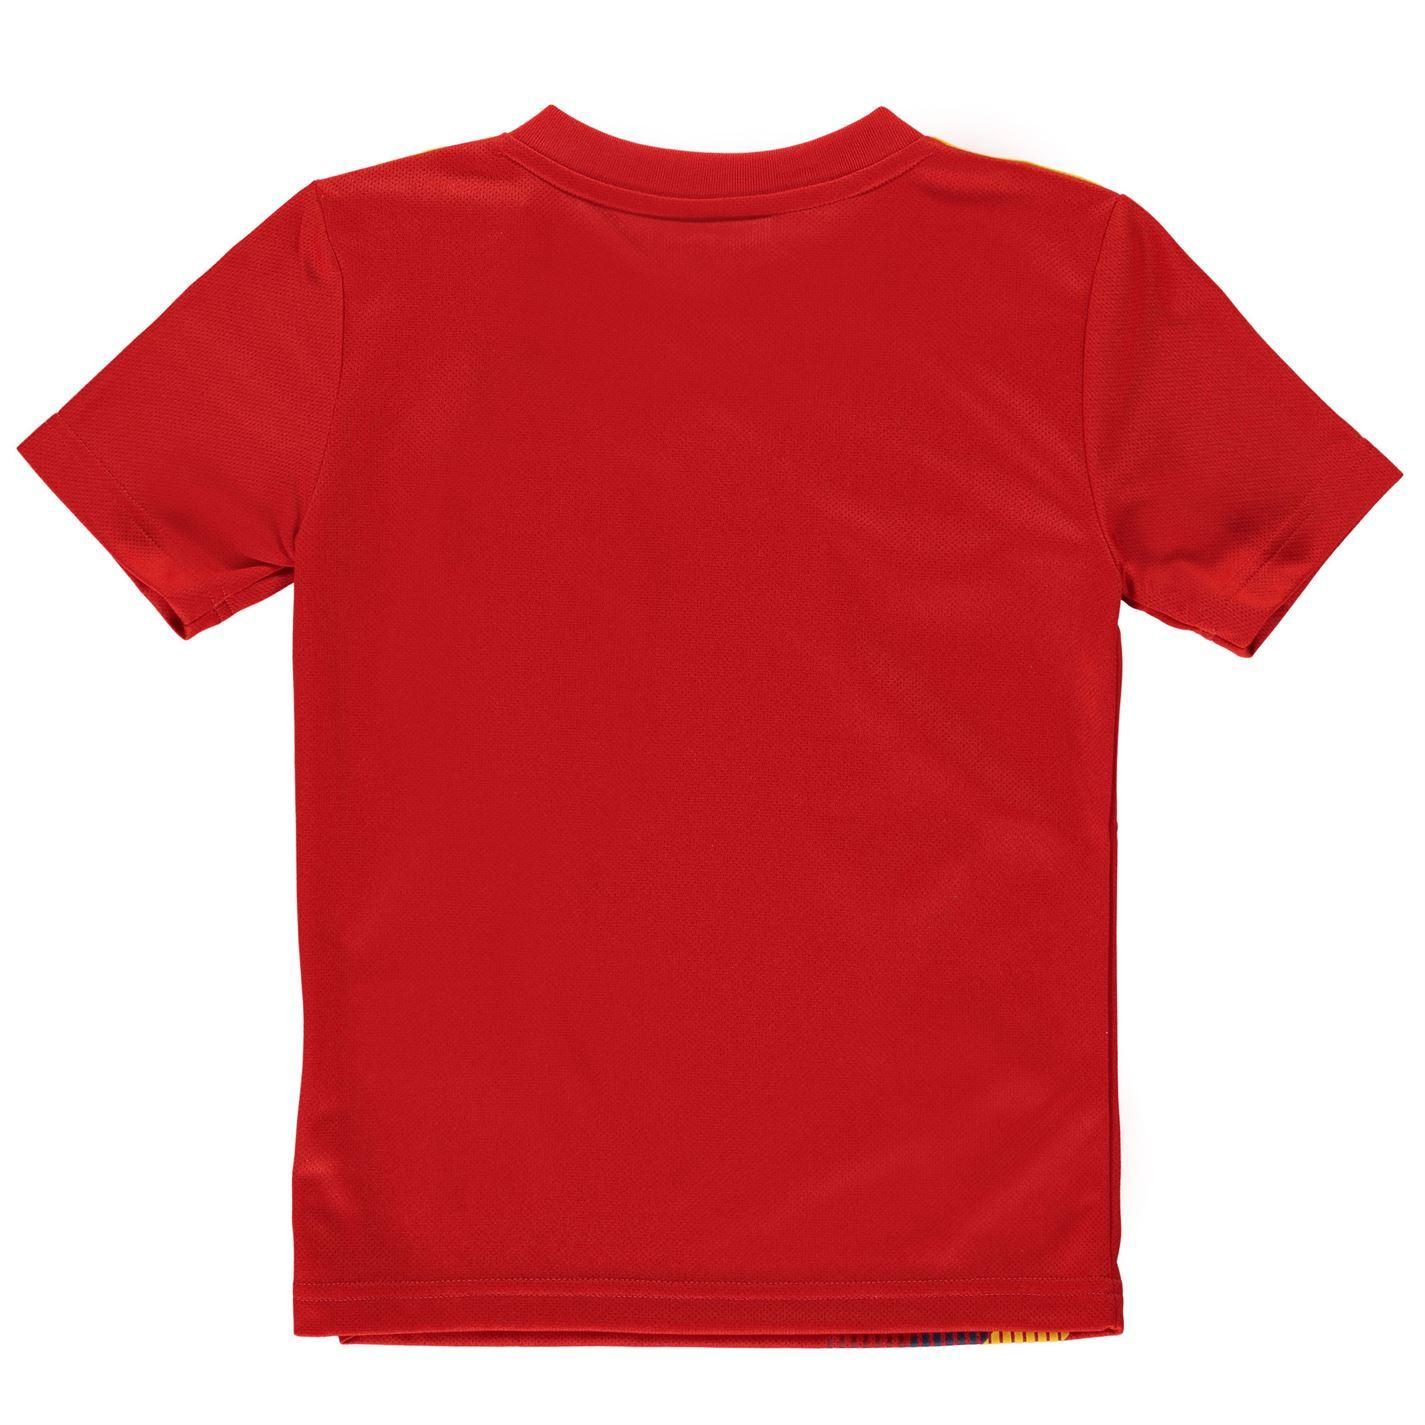 60233f3ce adidas Spain Home Jersey 2018 Juniors Red Gold Football Soccer Top Shirt  Strip